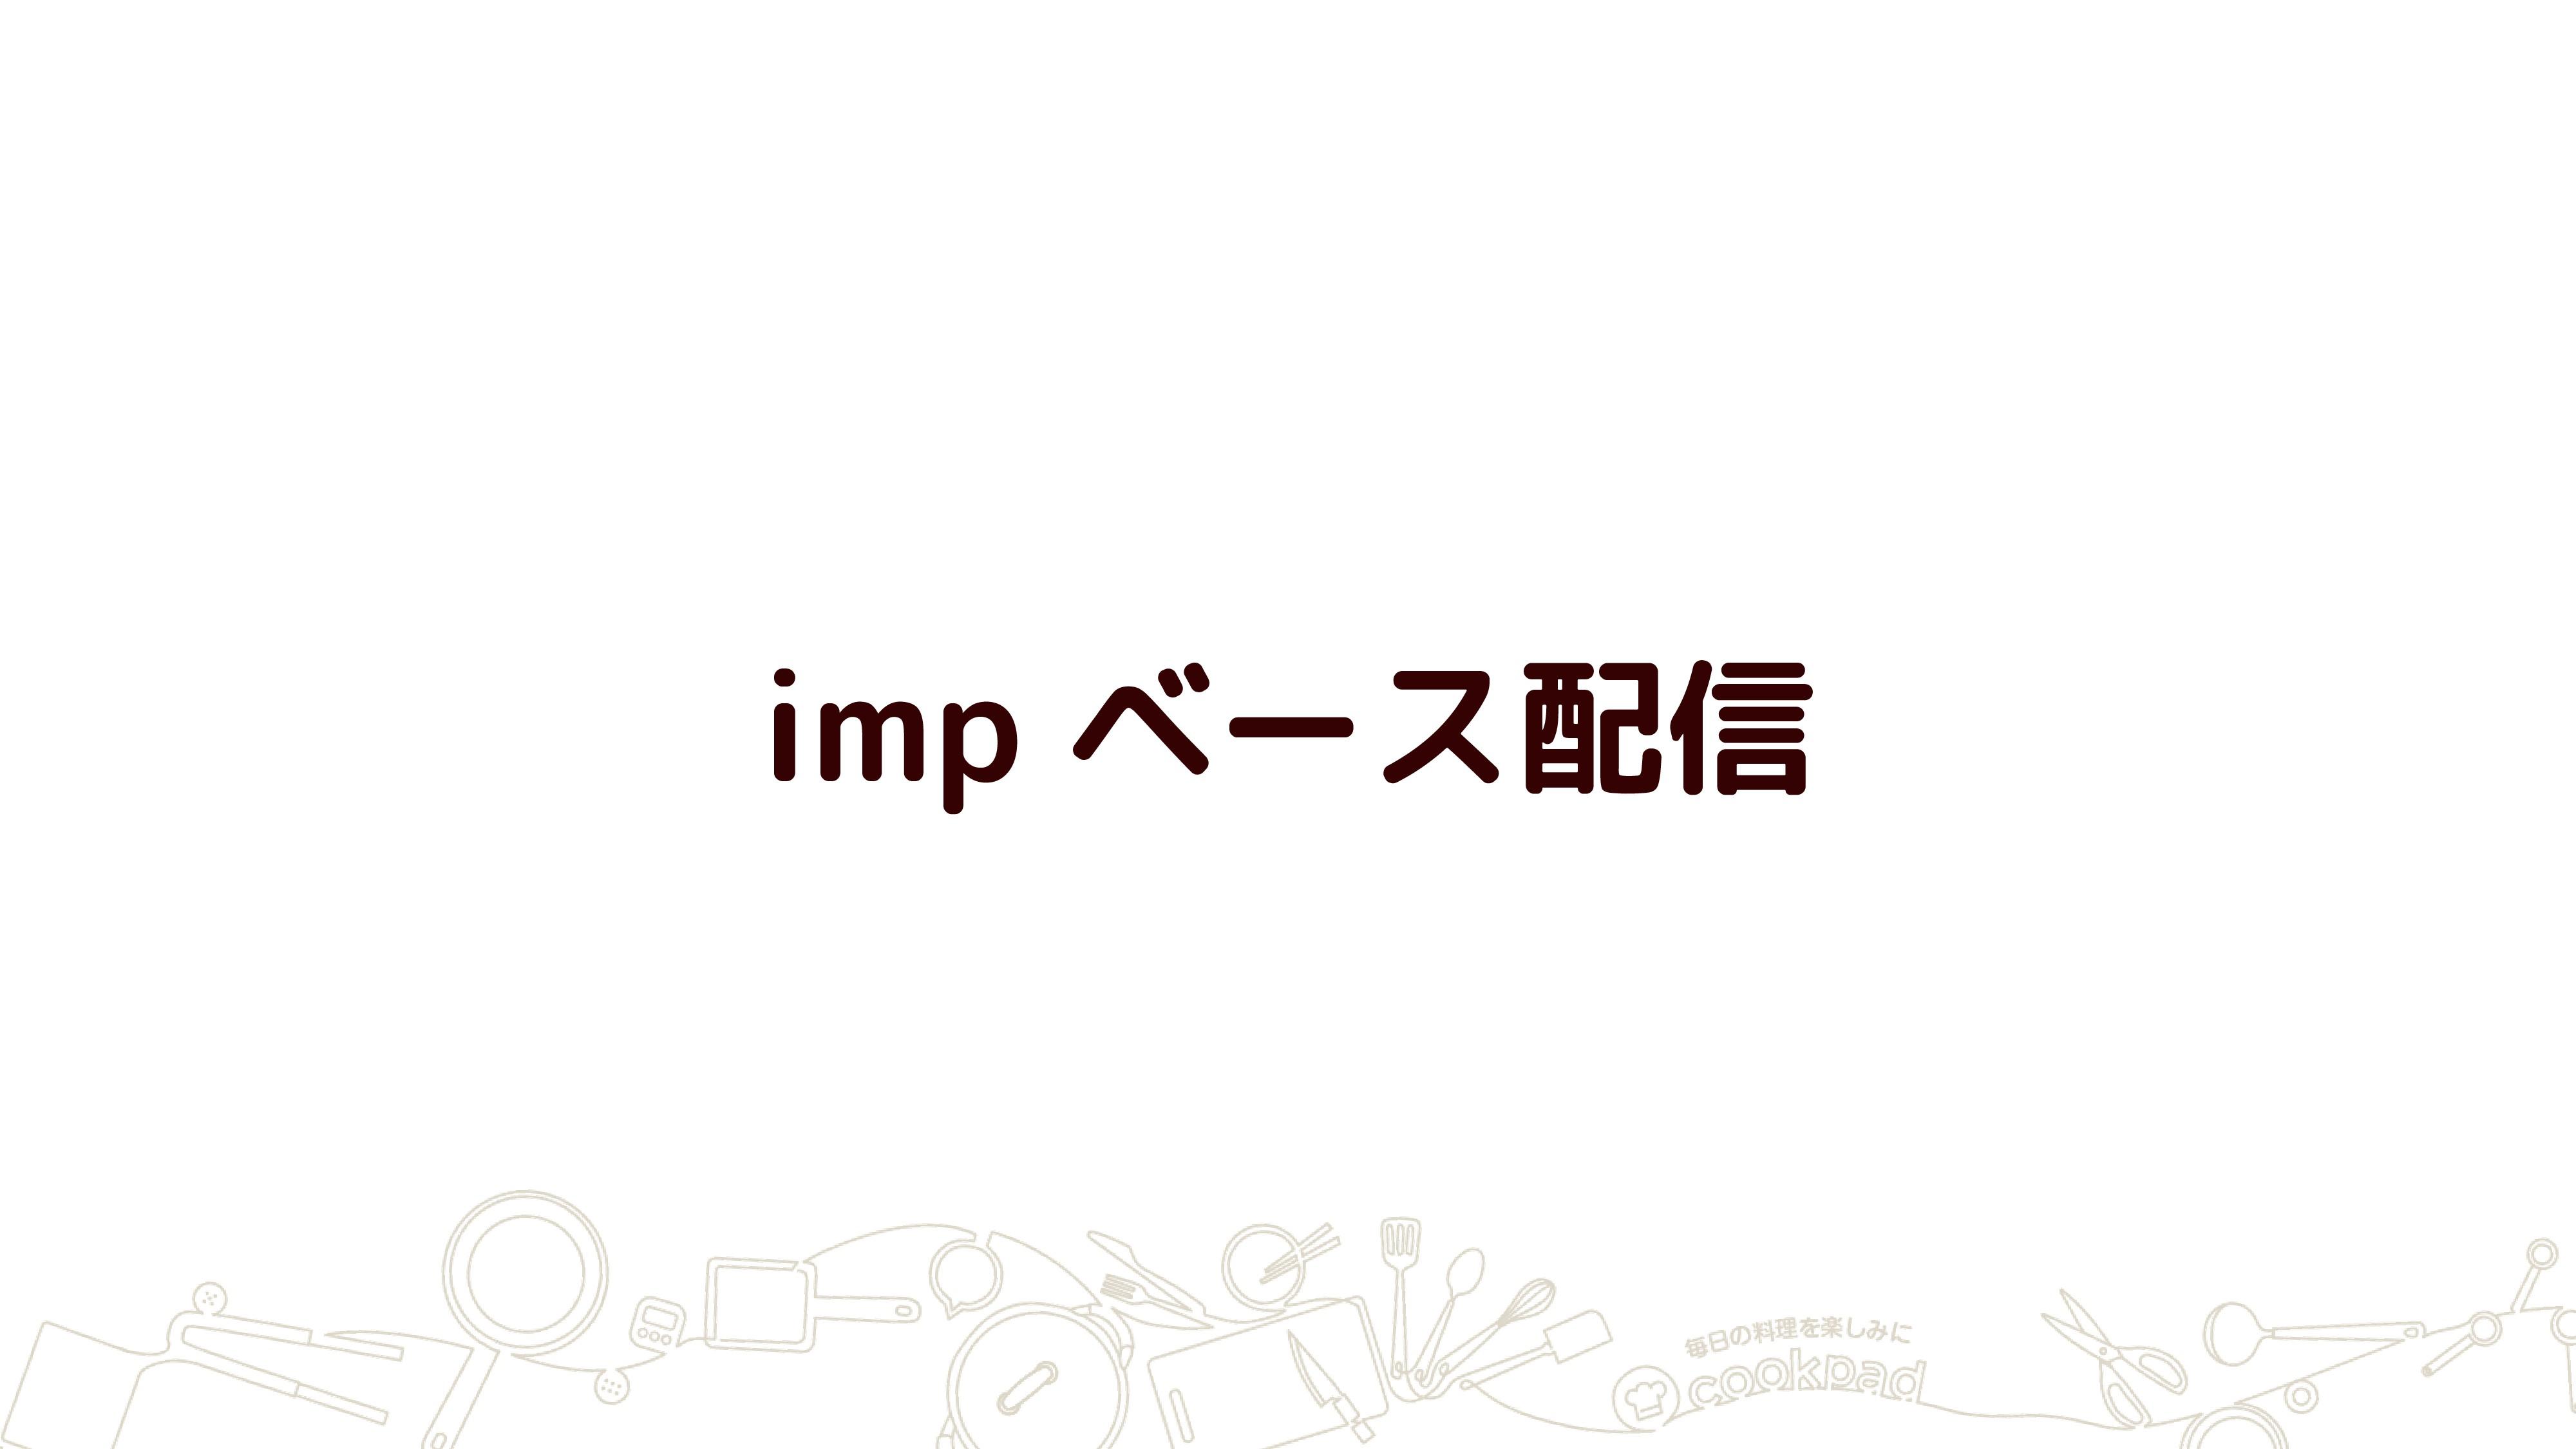 imp ベース配信